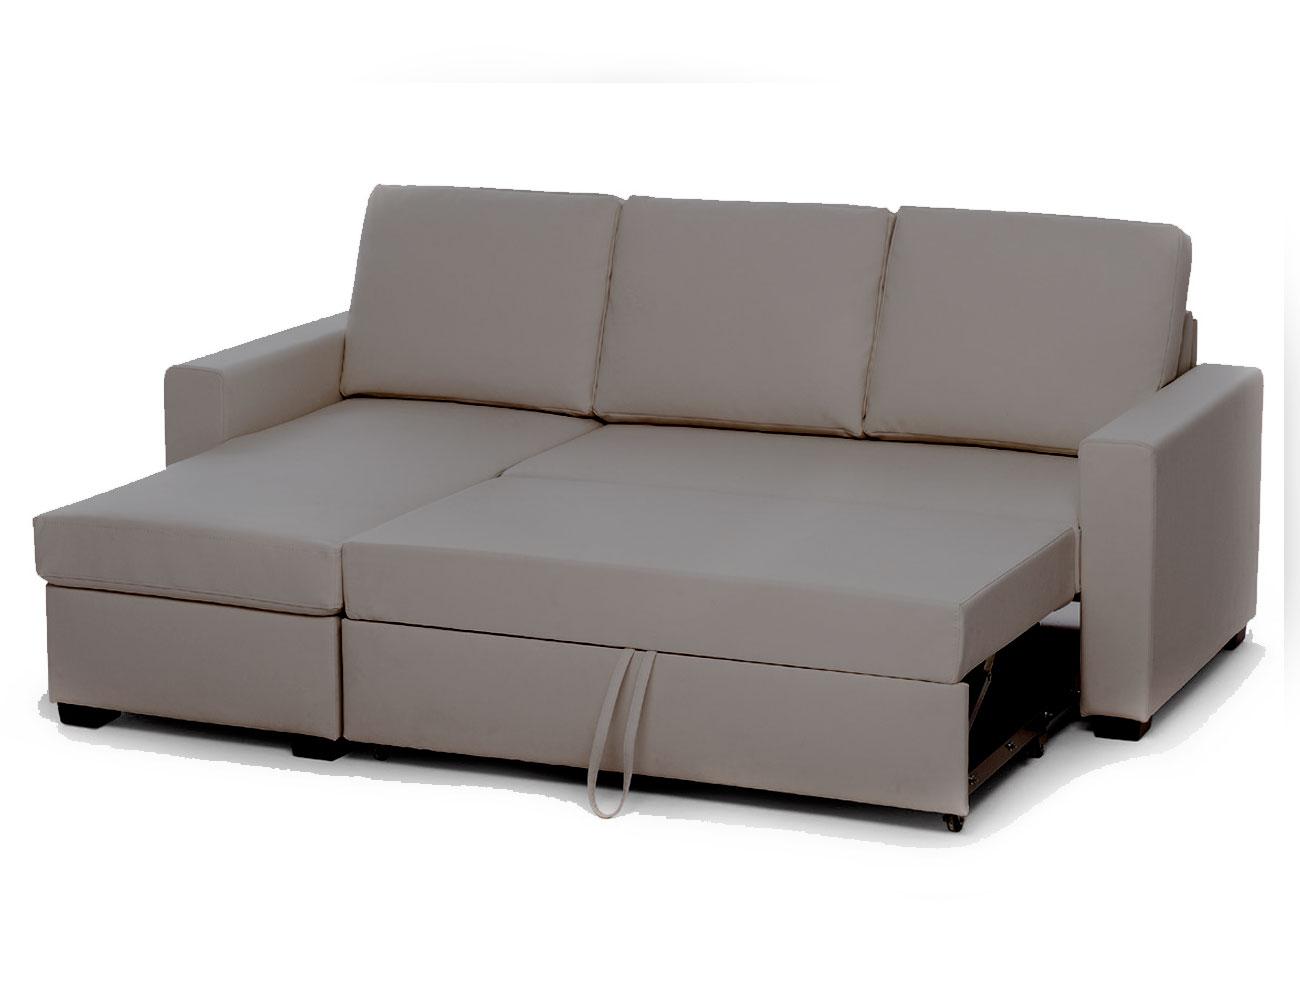 Sofa chaiselongue arcon cama